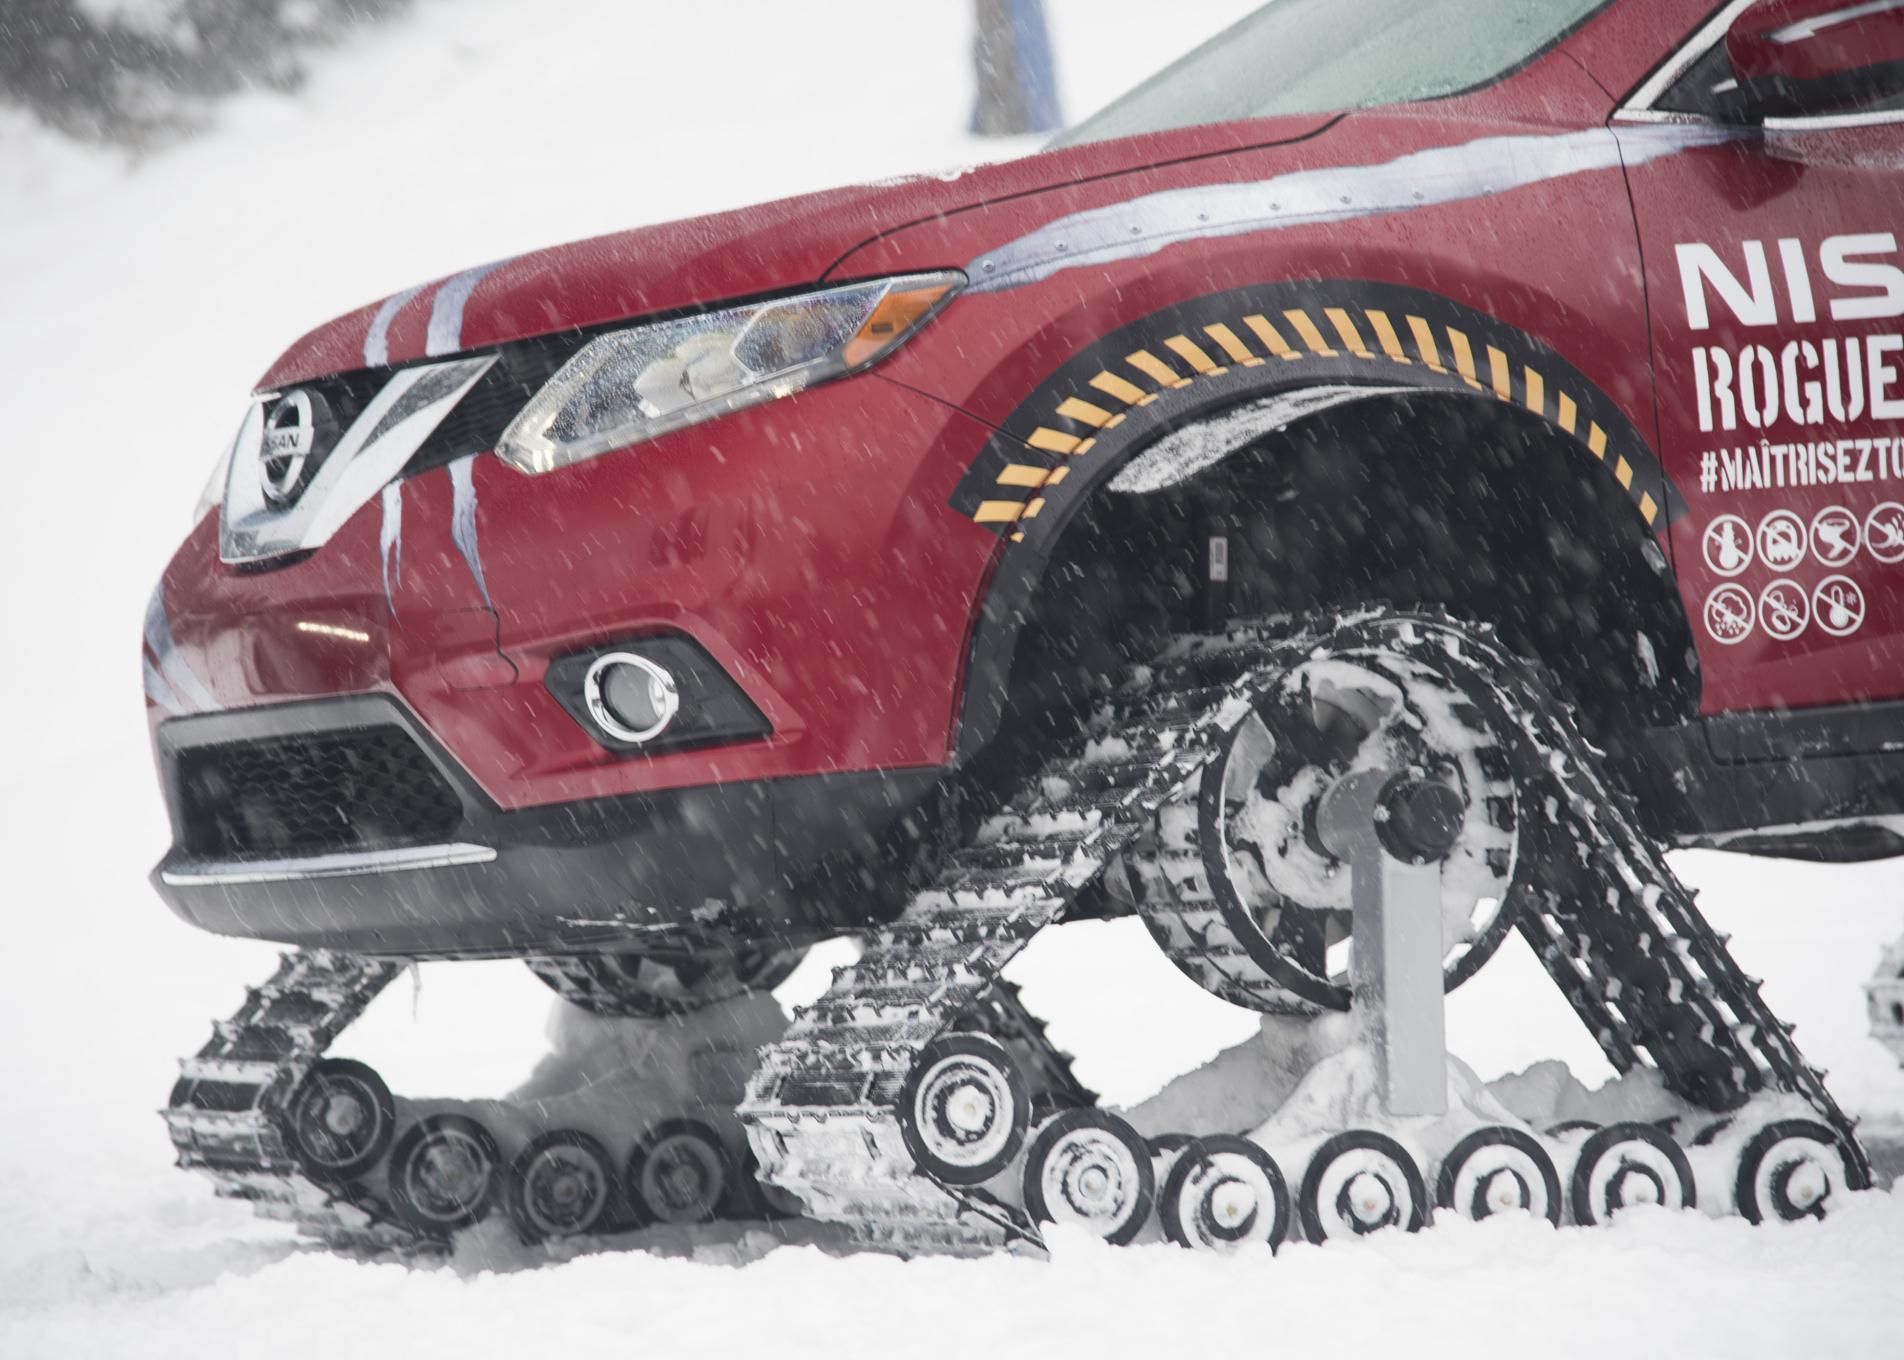 Ниссан  представляет новый проект X-Trail Trail Warrior